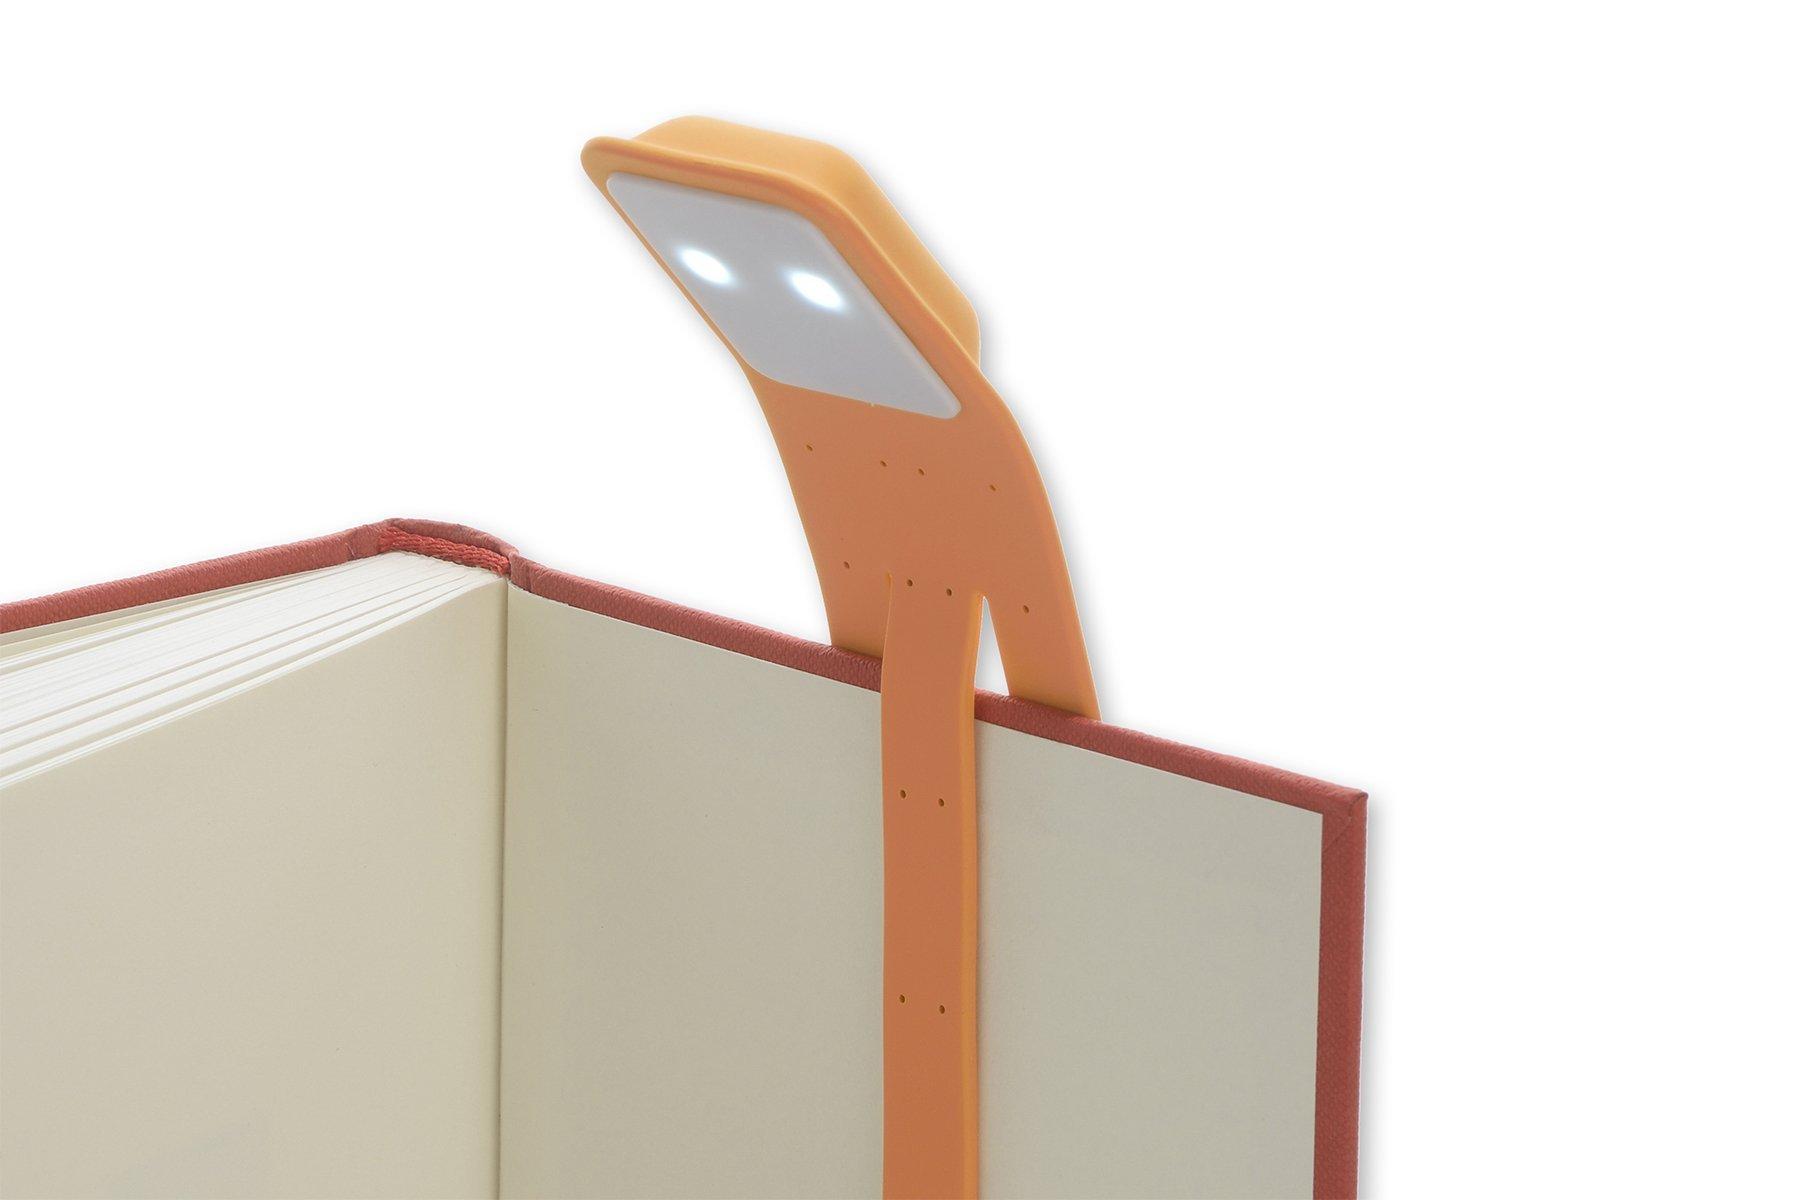 moleskine rechargeable booklight cadmium orange reading